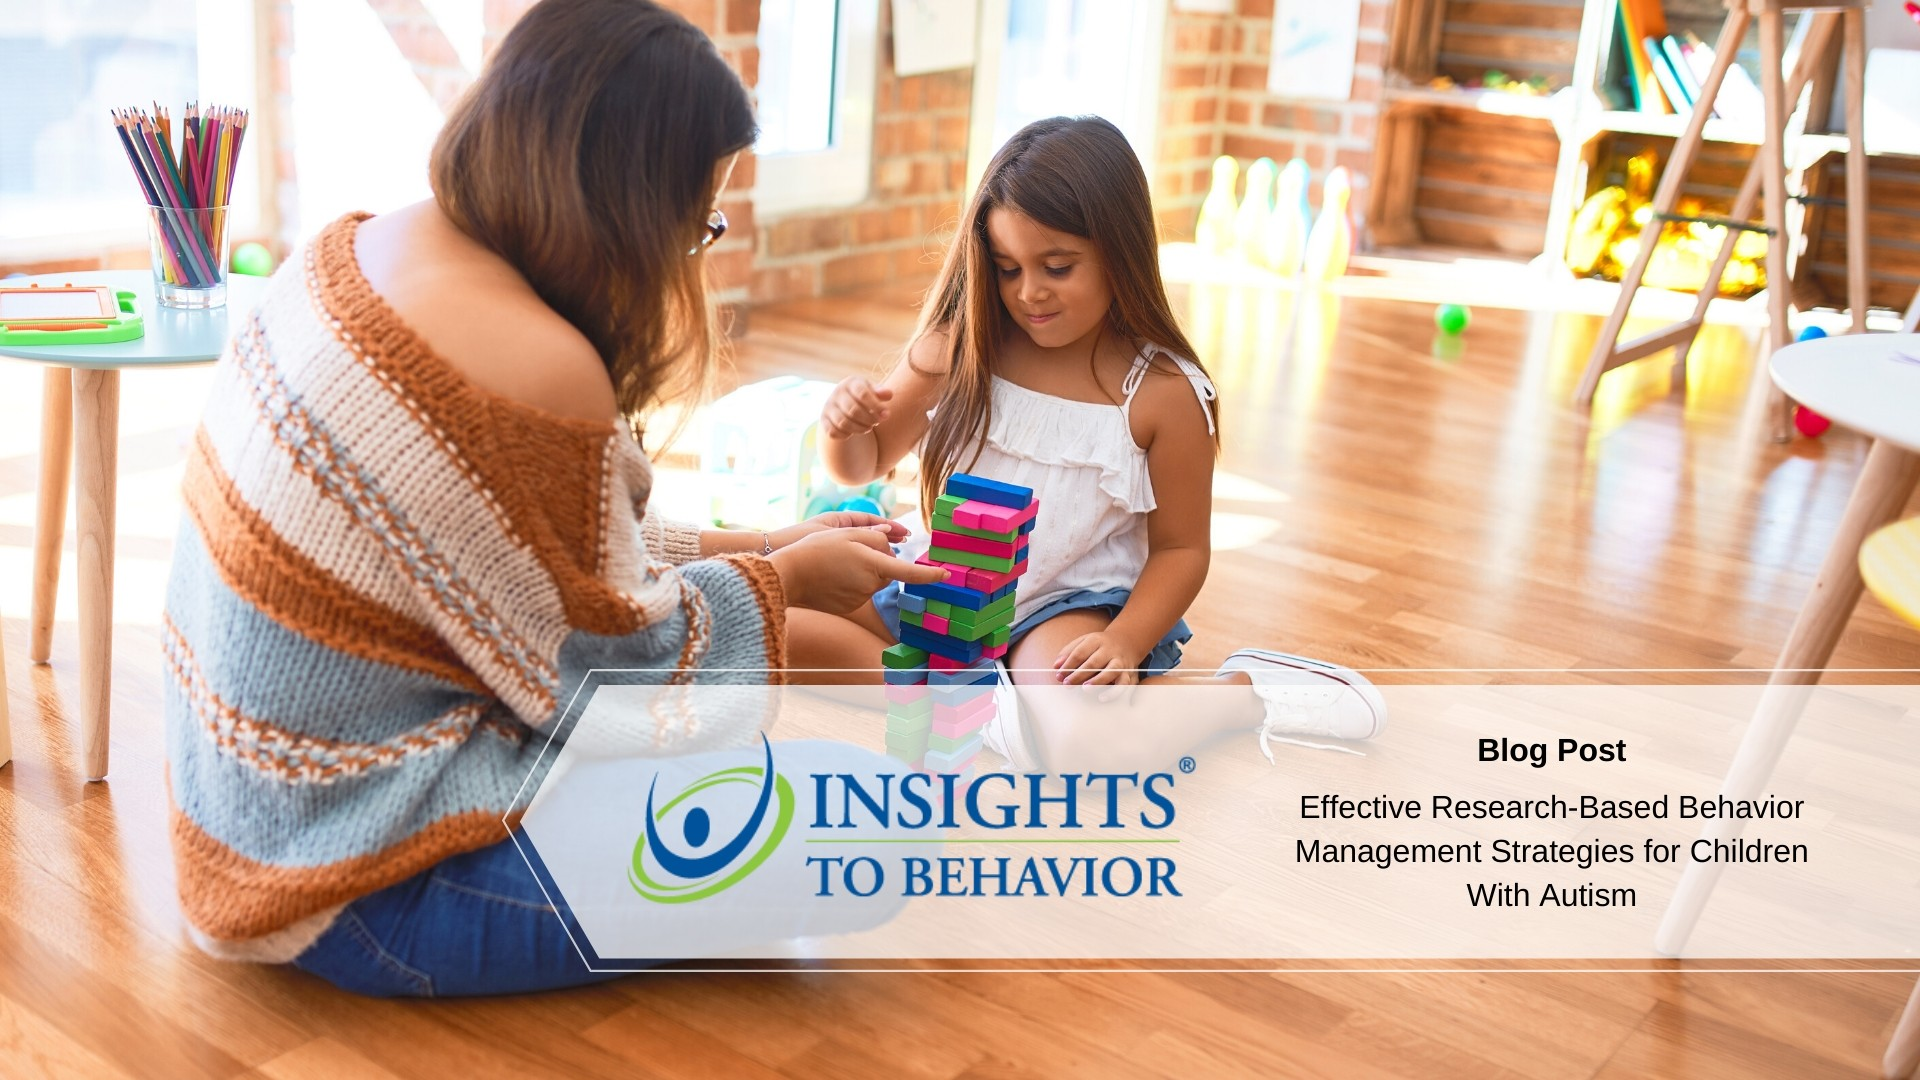 Effective research-based behavior management strategies.